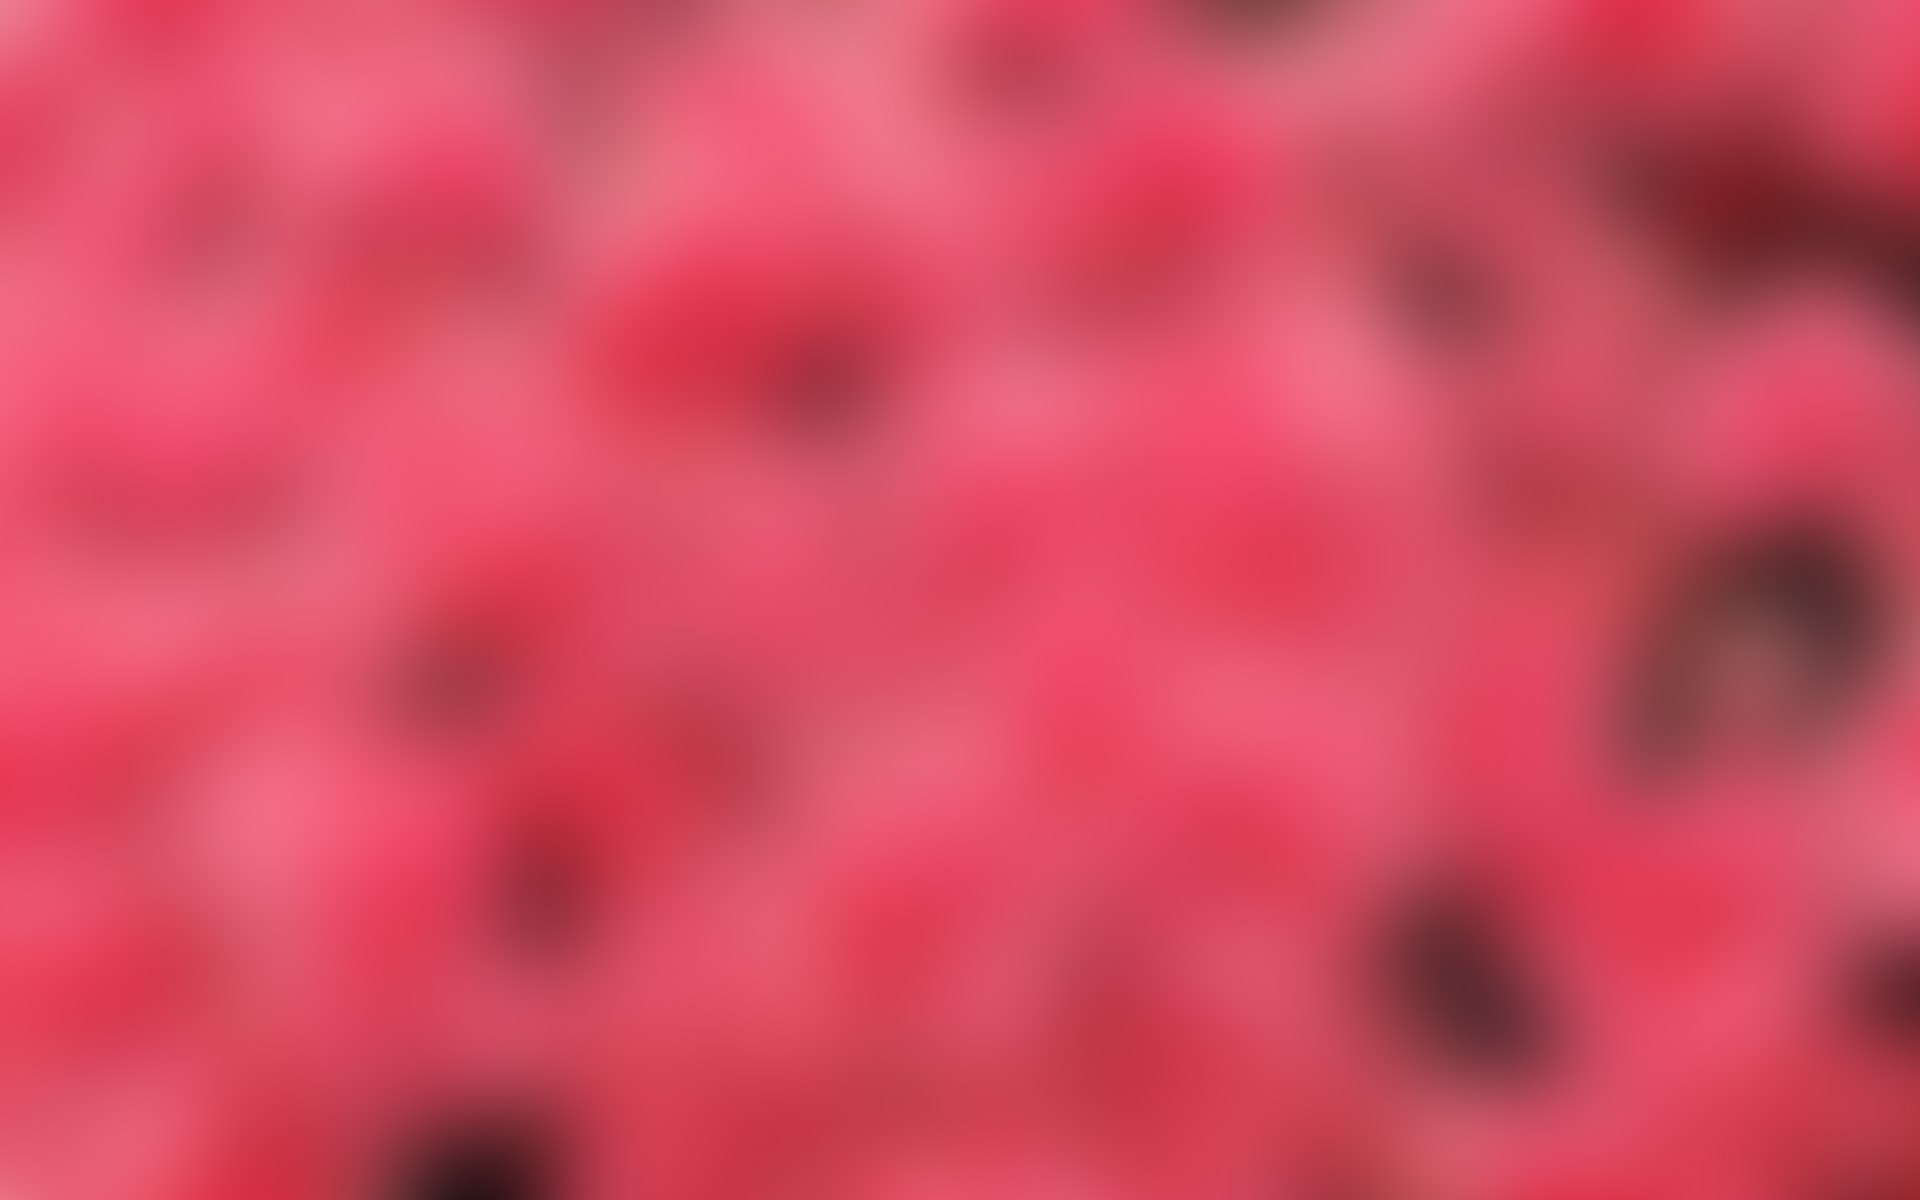 Pink Background Desktop Full HD desktop wallpaper Wallinda 1920x1200